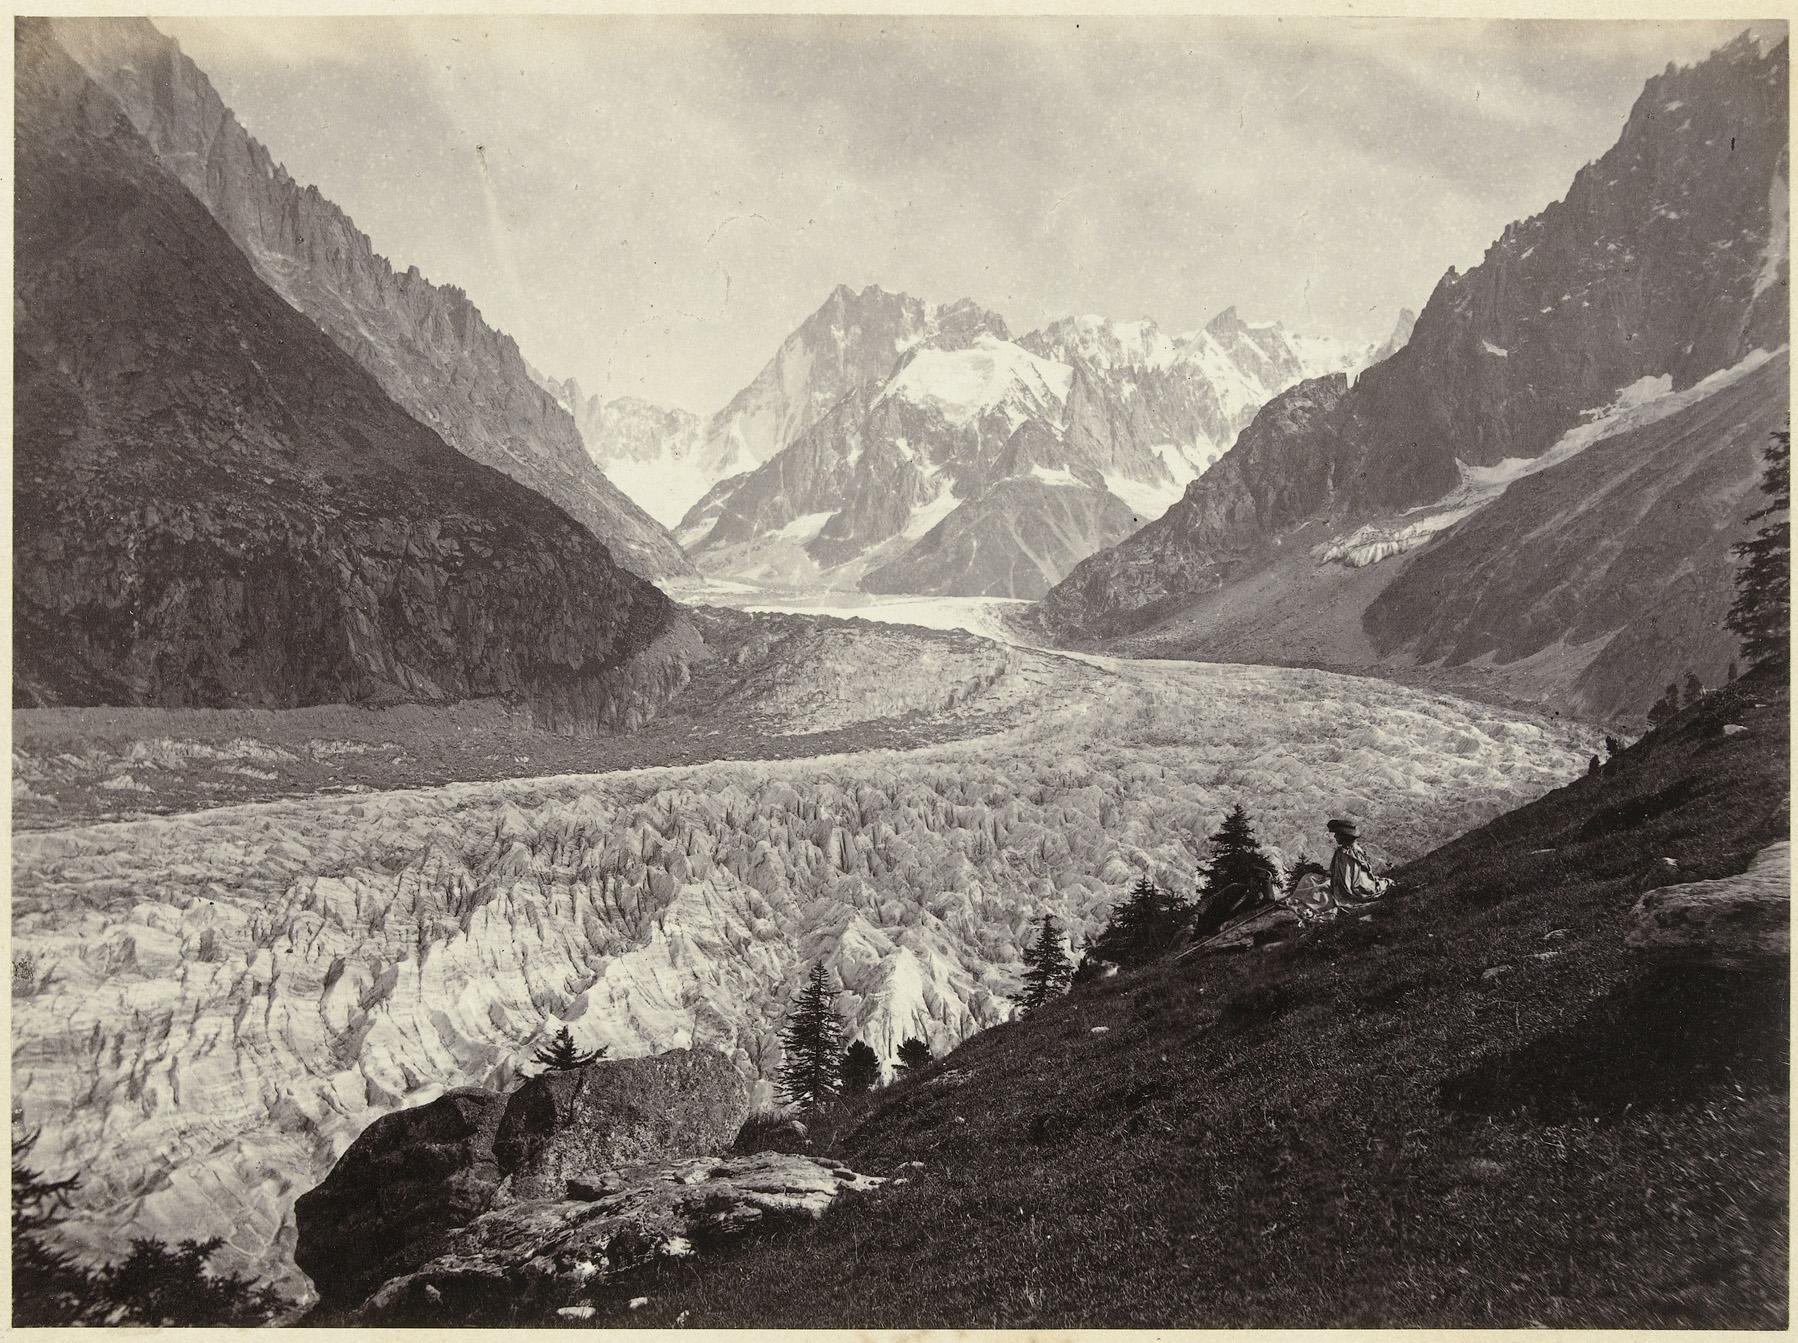 Gletsjer in Zwitserland; Views of Switzerland and Savoy; La mer de glace Montenvers, Chamonix. Photo courtesy of  Europena Collections